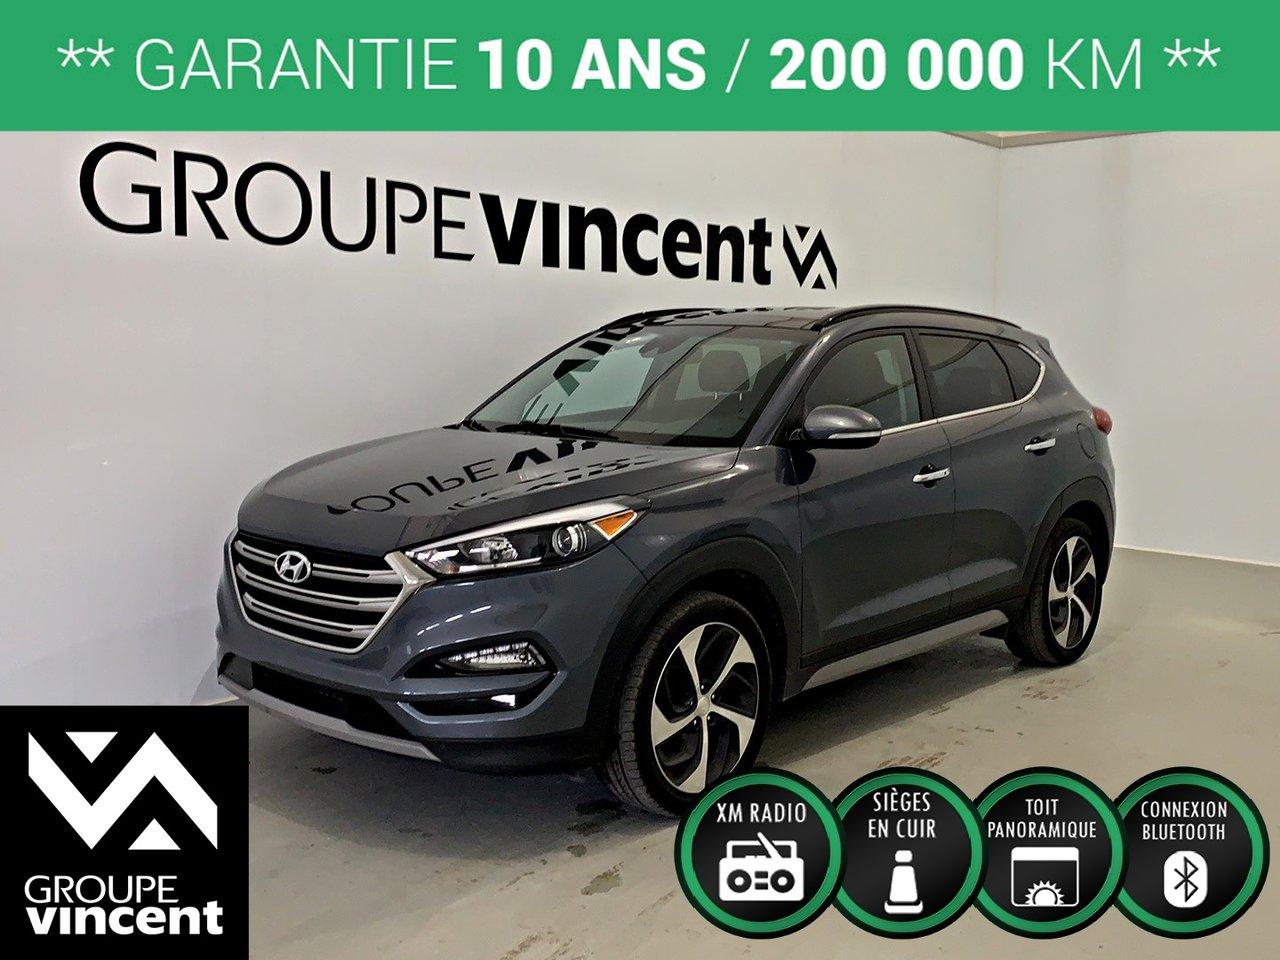 2017 Hyundai  Tucson ULTIMATE AWD GPS CUIR TOIT ** GARANTIE 10 ANS